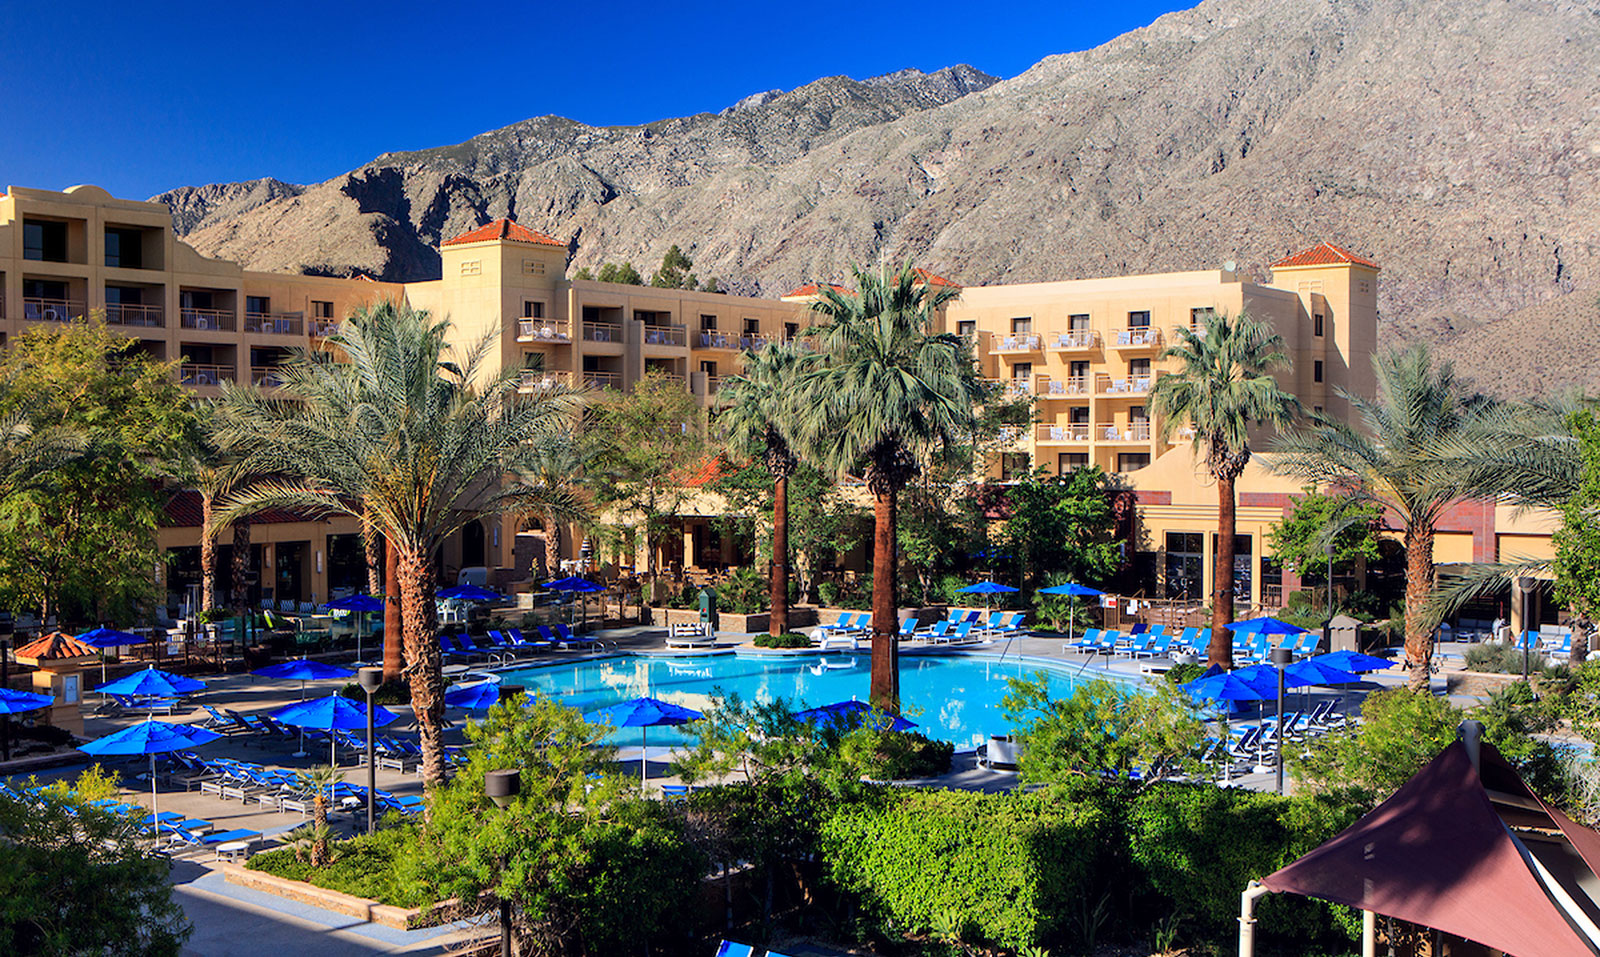 renaissance-palm-springs-hotel-new